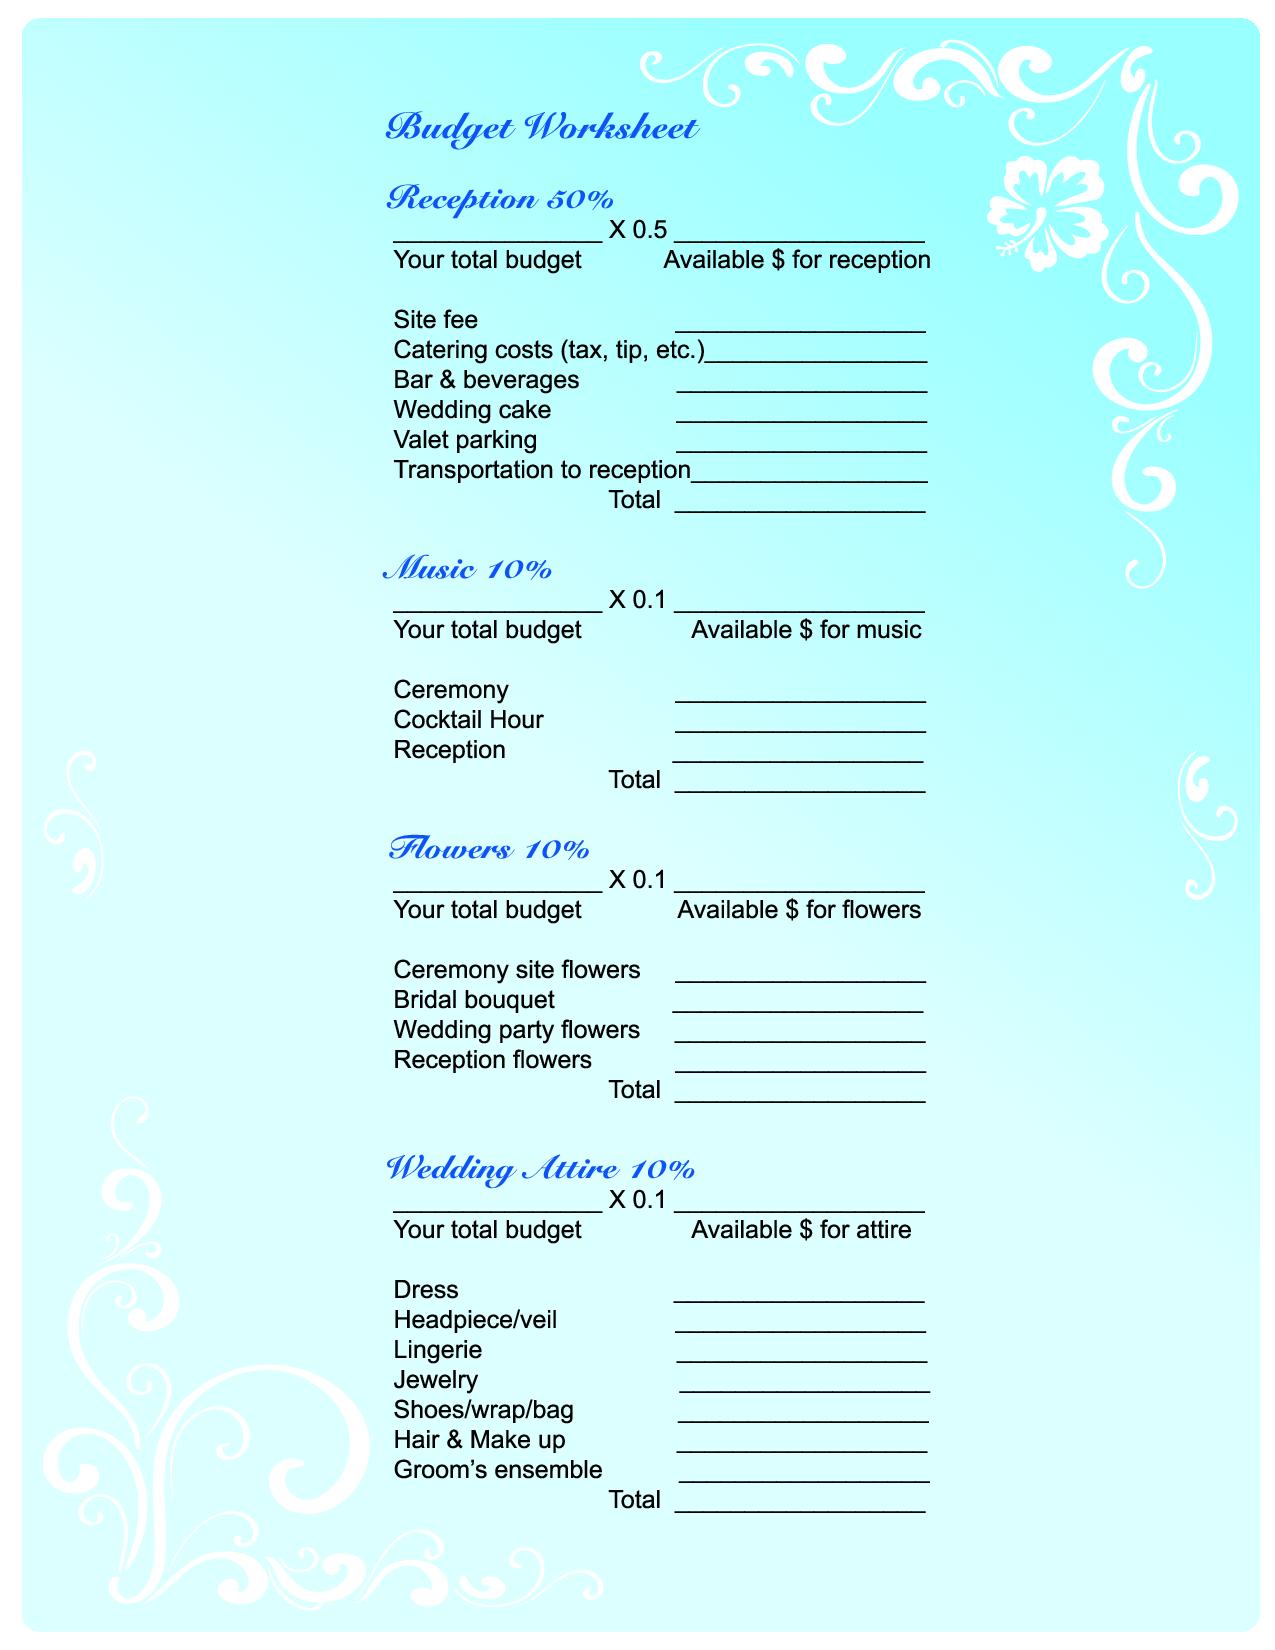 Free Wedding Planning Budget Worksheet Quelles Astuces